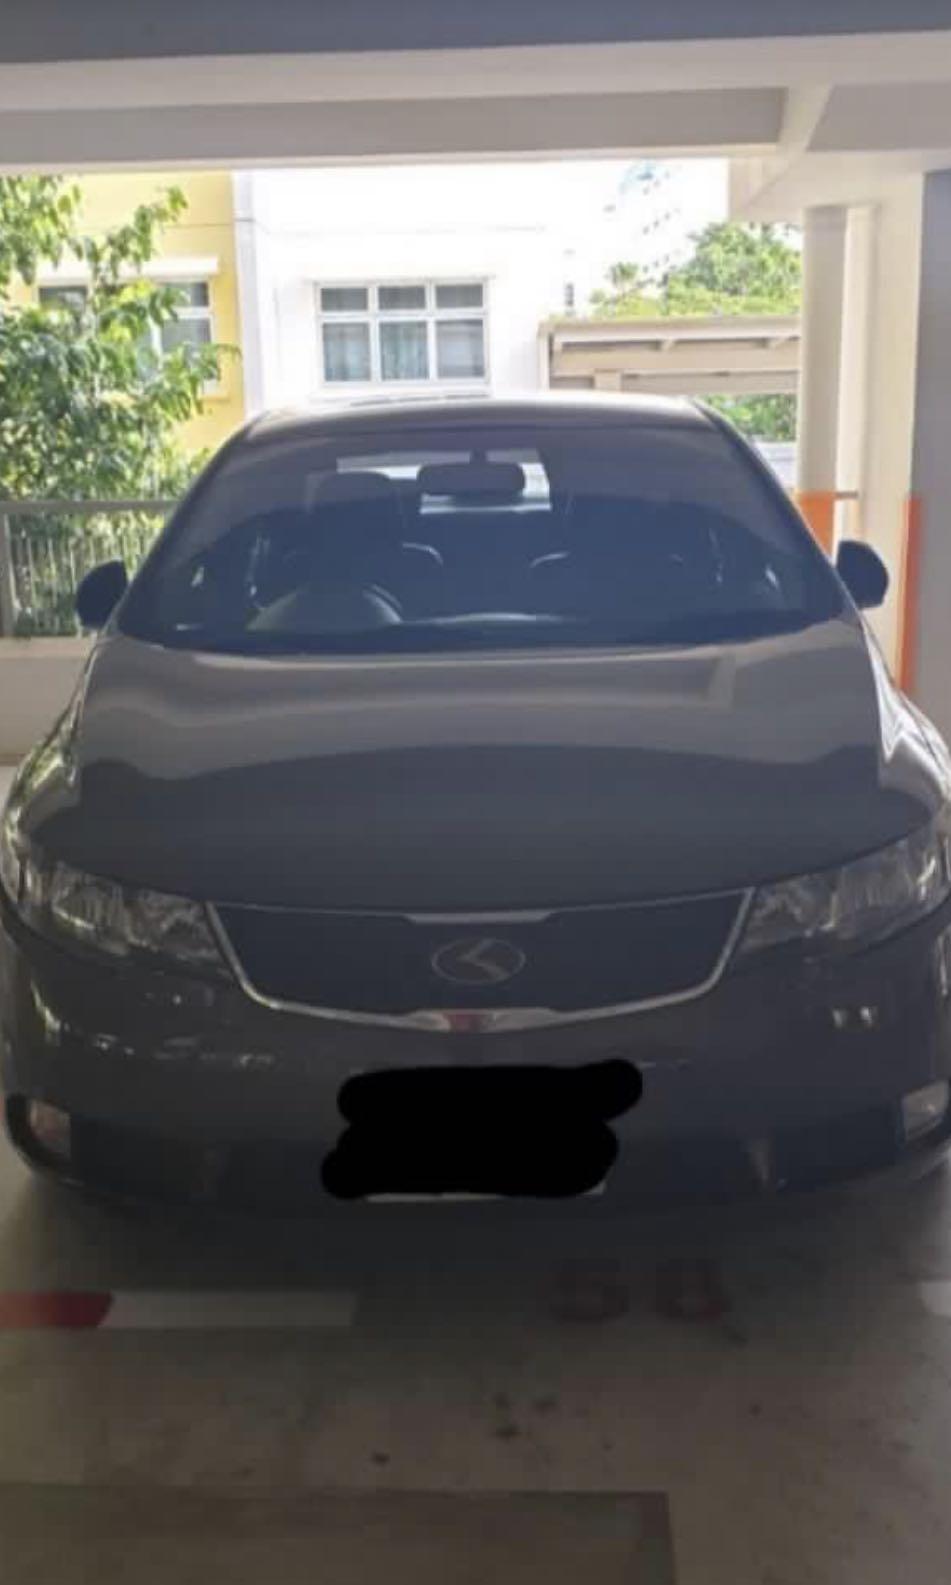 Kia Cerato Auto Rental / No Deposit / PERSONAL CAR